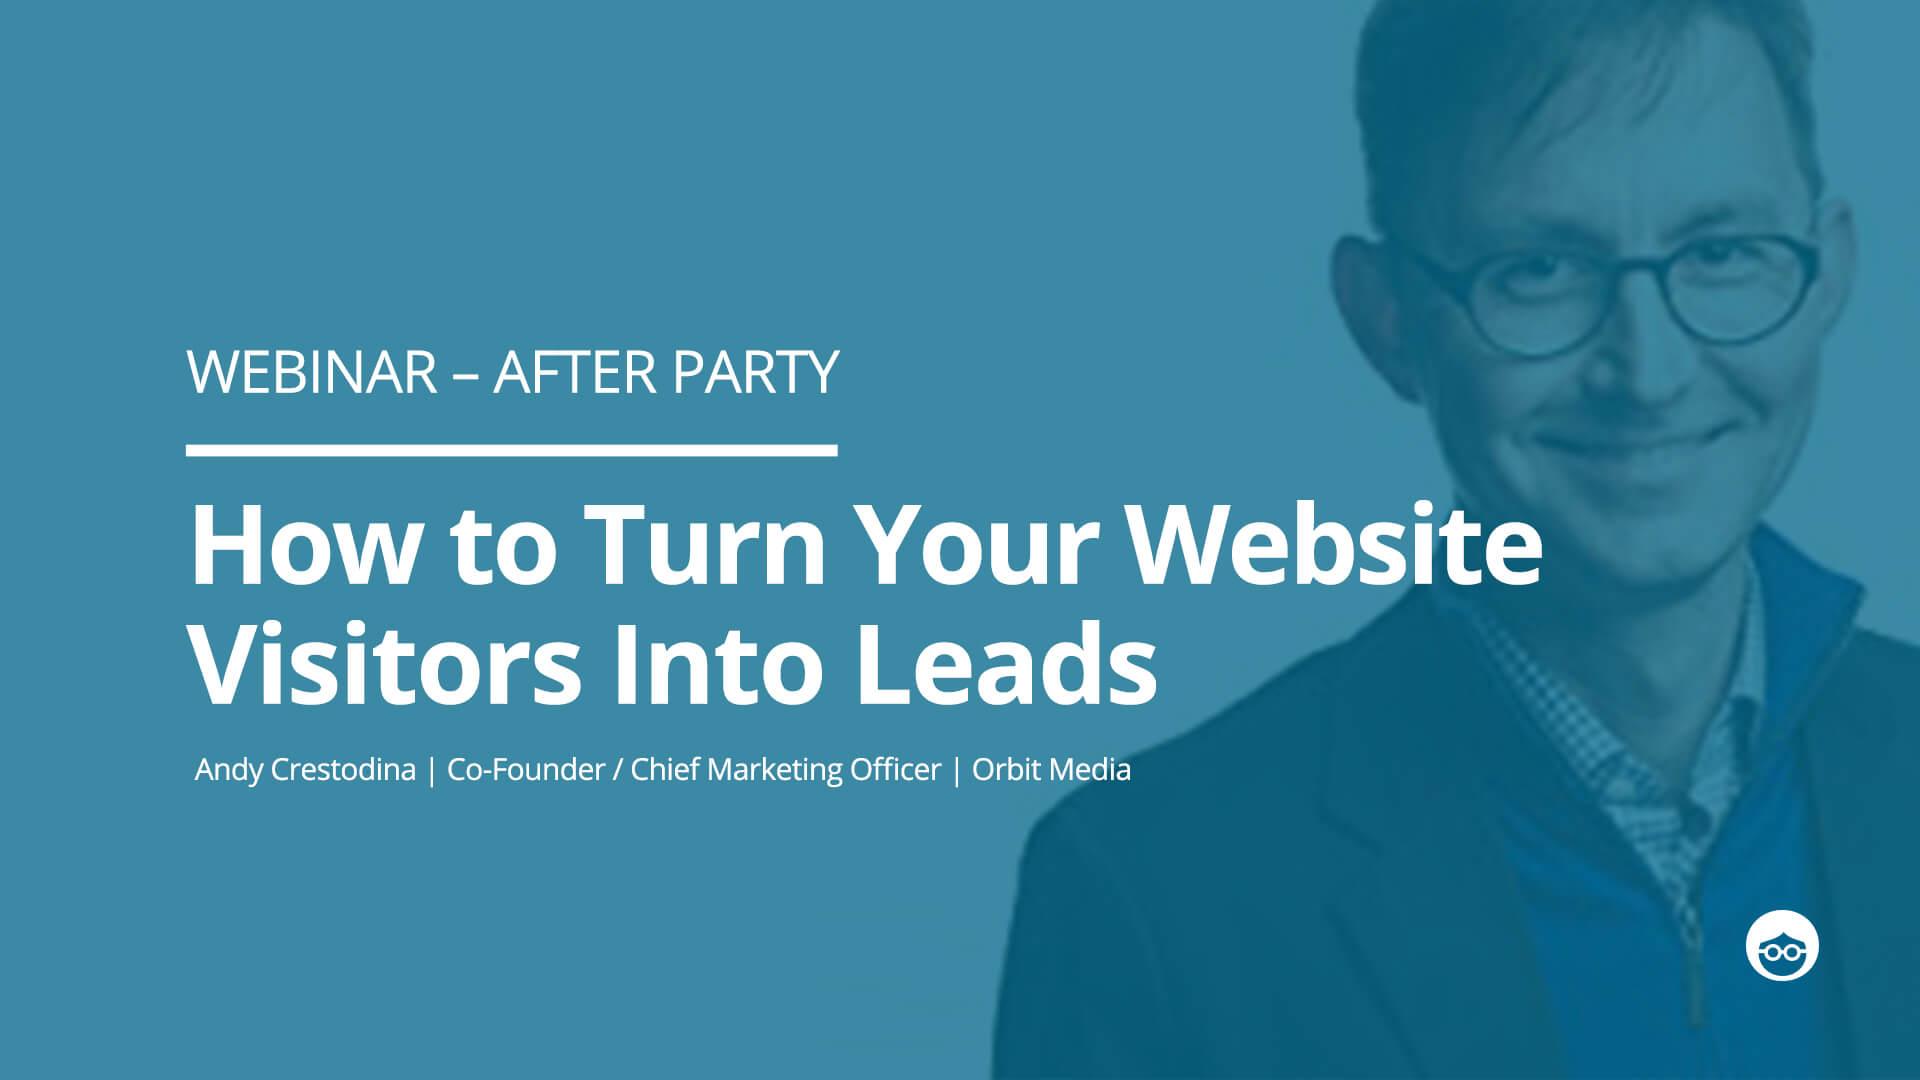 Webinar After party- Andy Crestodina